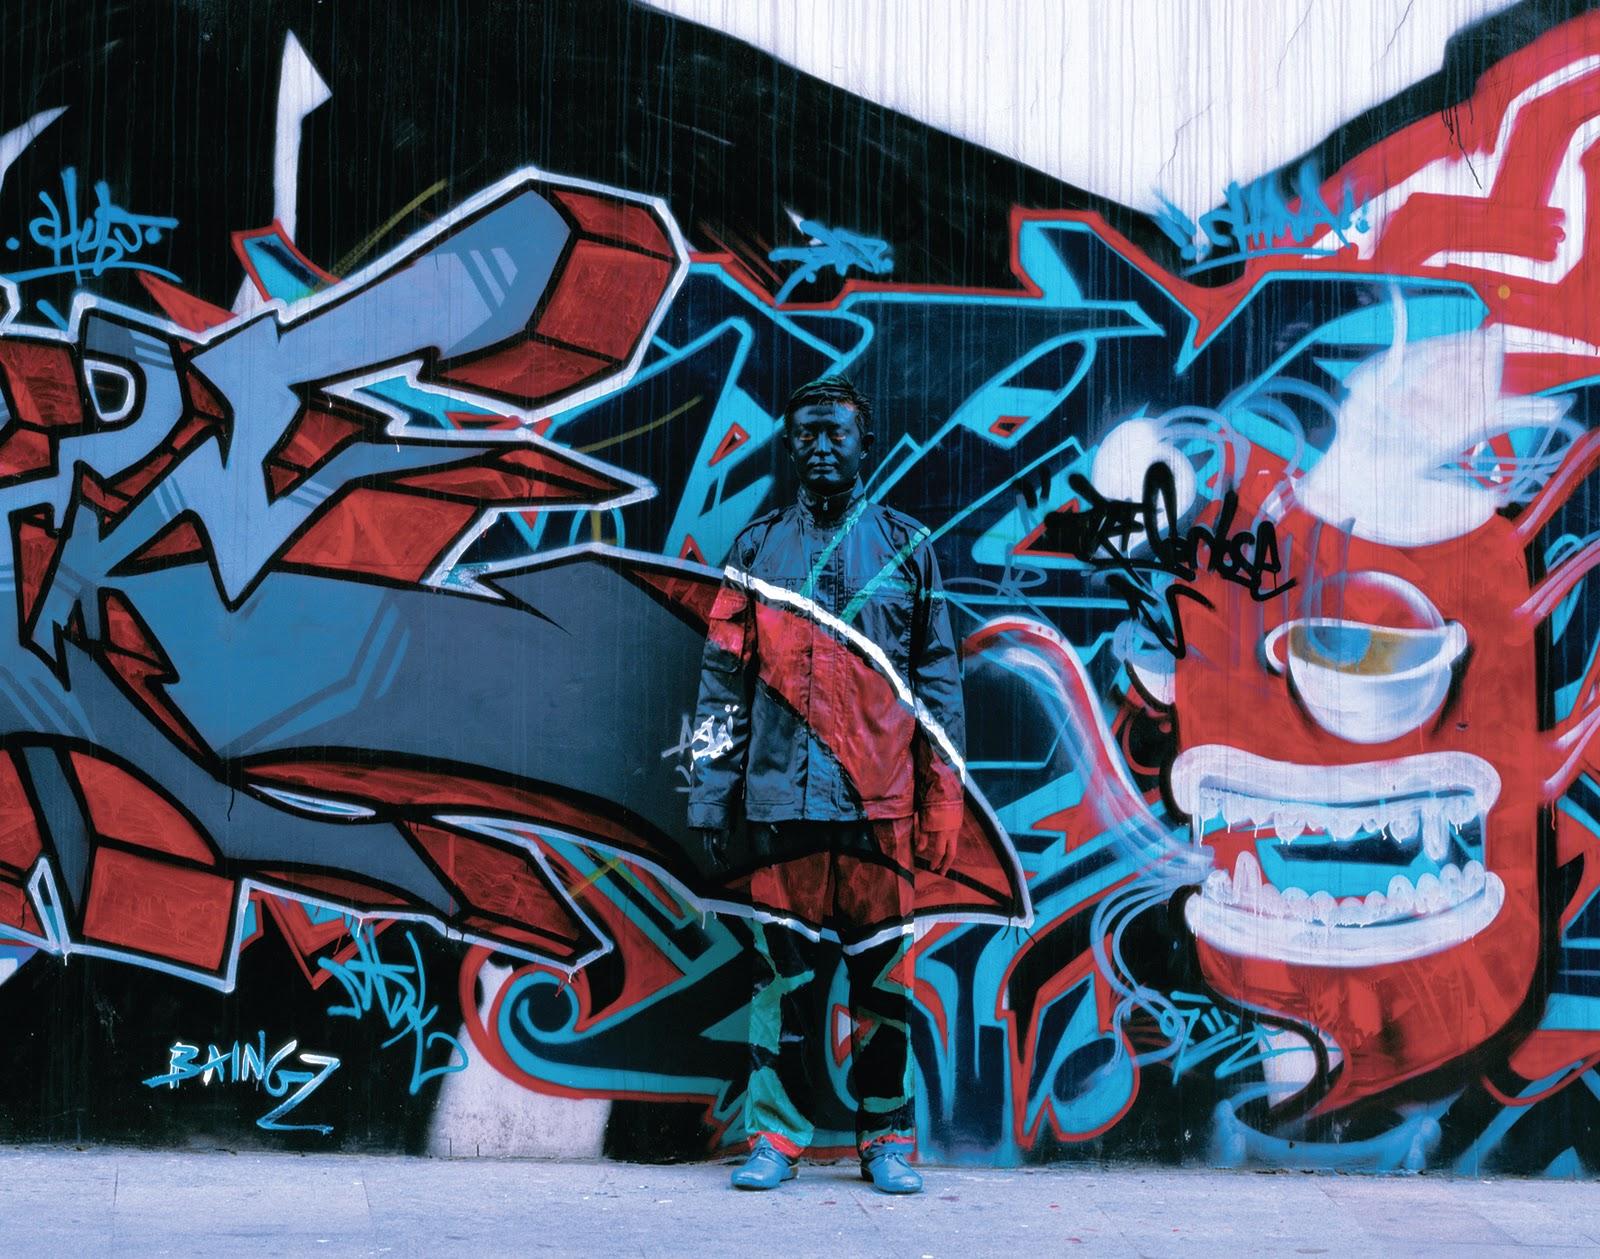 Liu_Bolin_HITC_No_69_Graffiti_photograph___120x95cm_2008